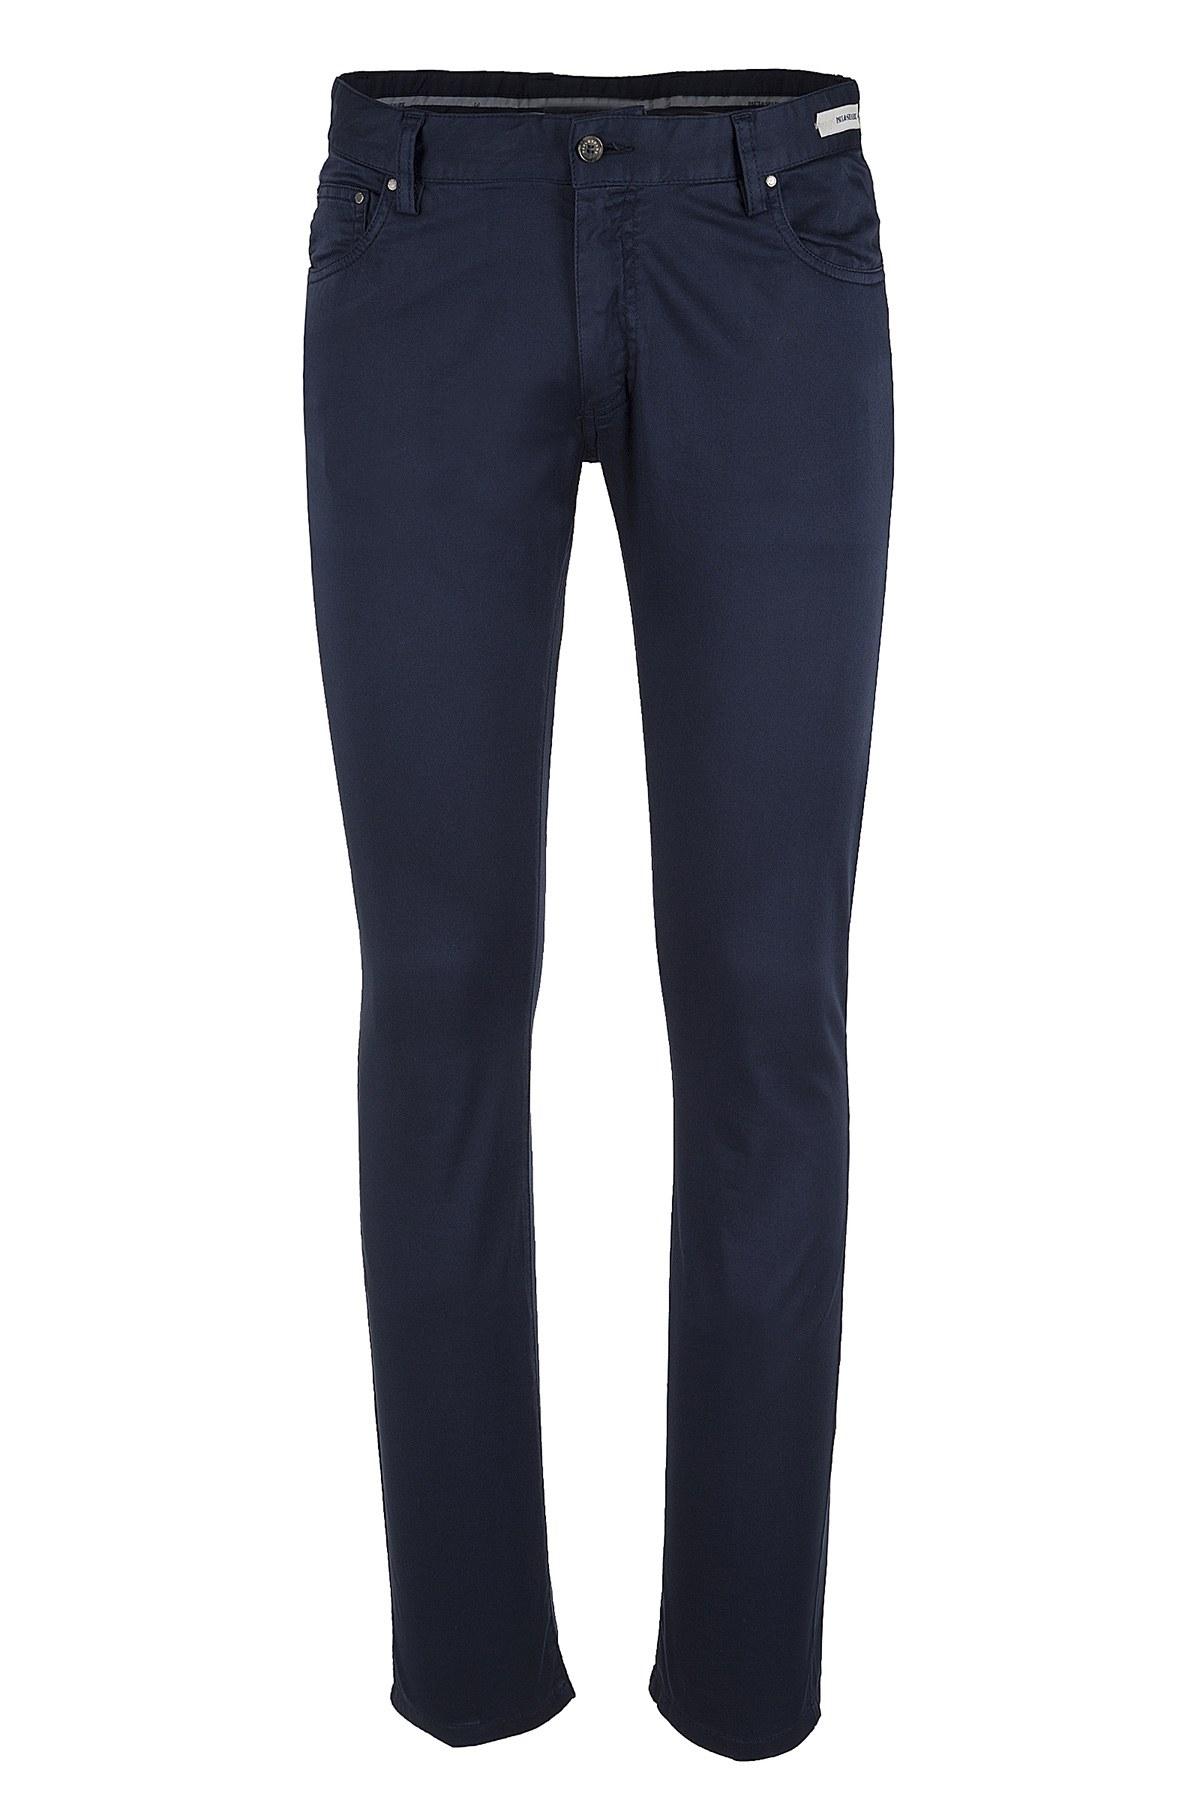 PAUL&SHARK JEANS Erkek Pamuklu Pantolon P18P4131SF 013 LACİVERT